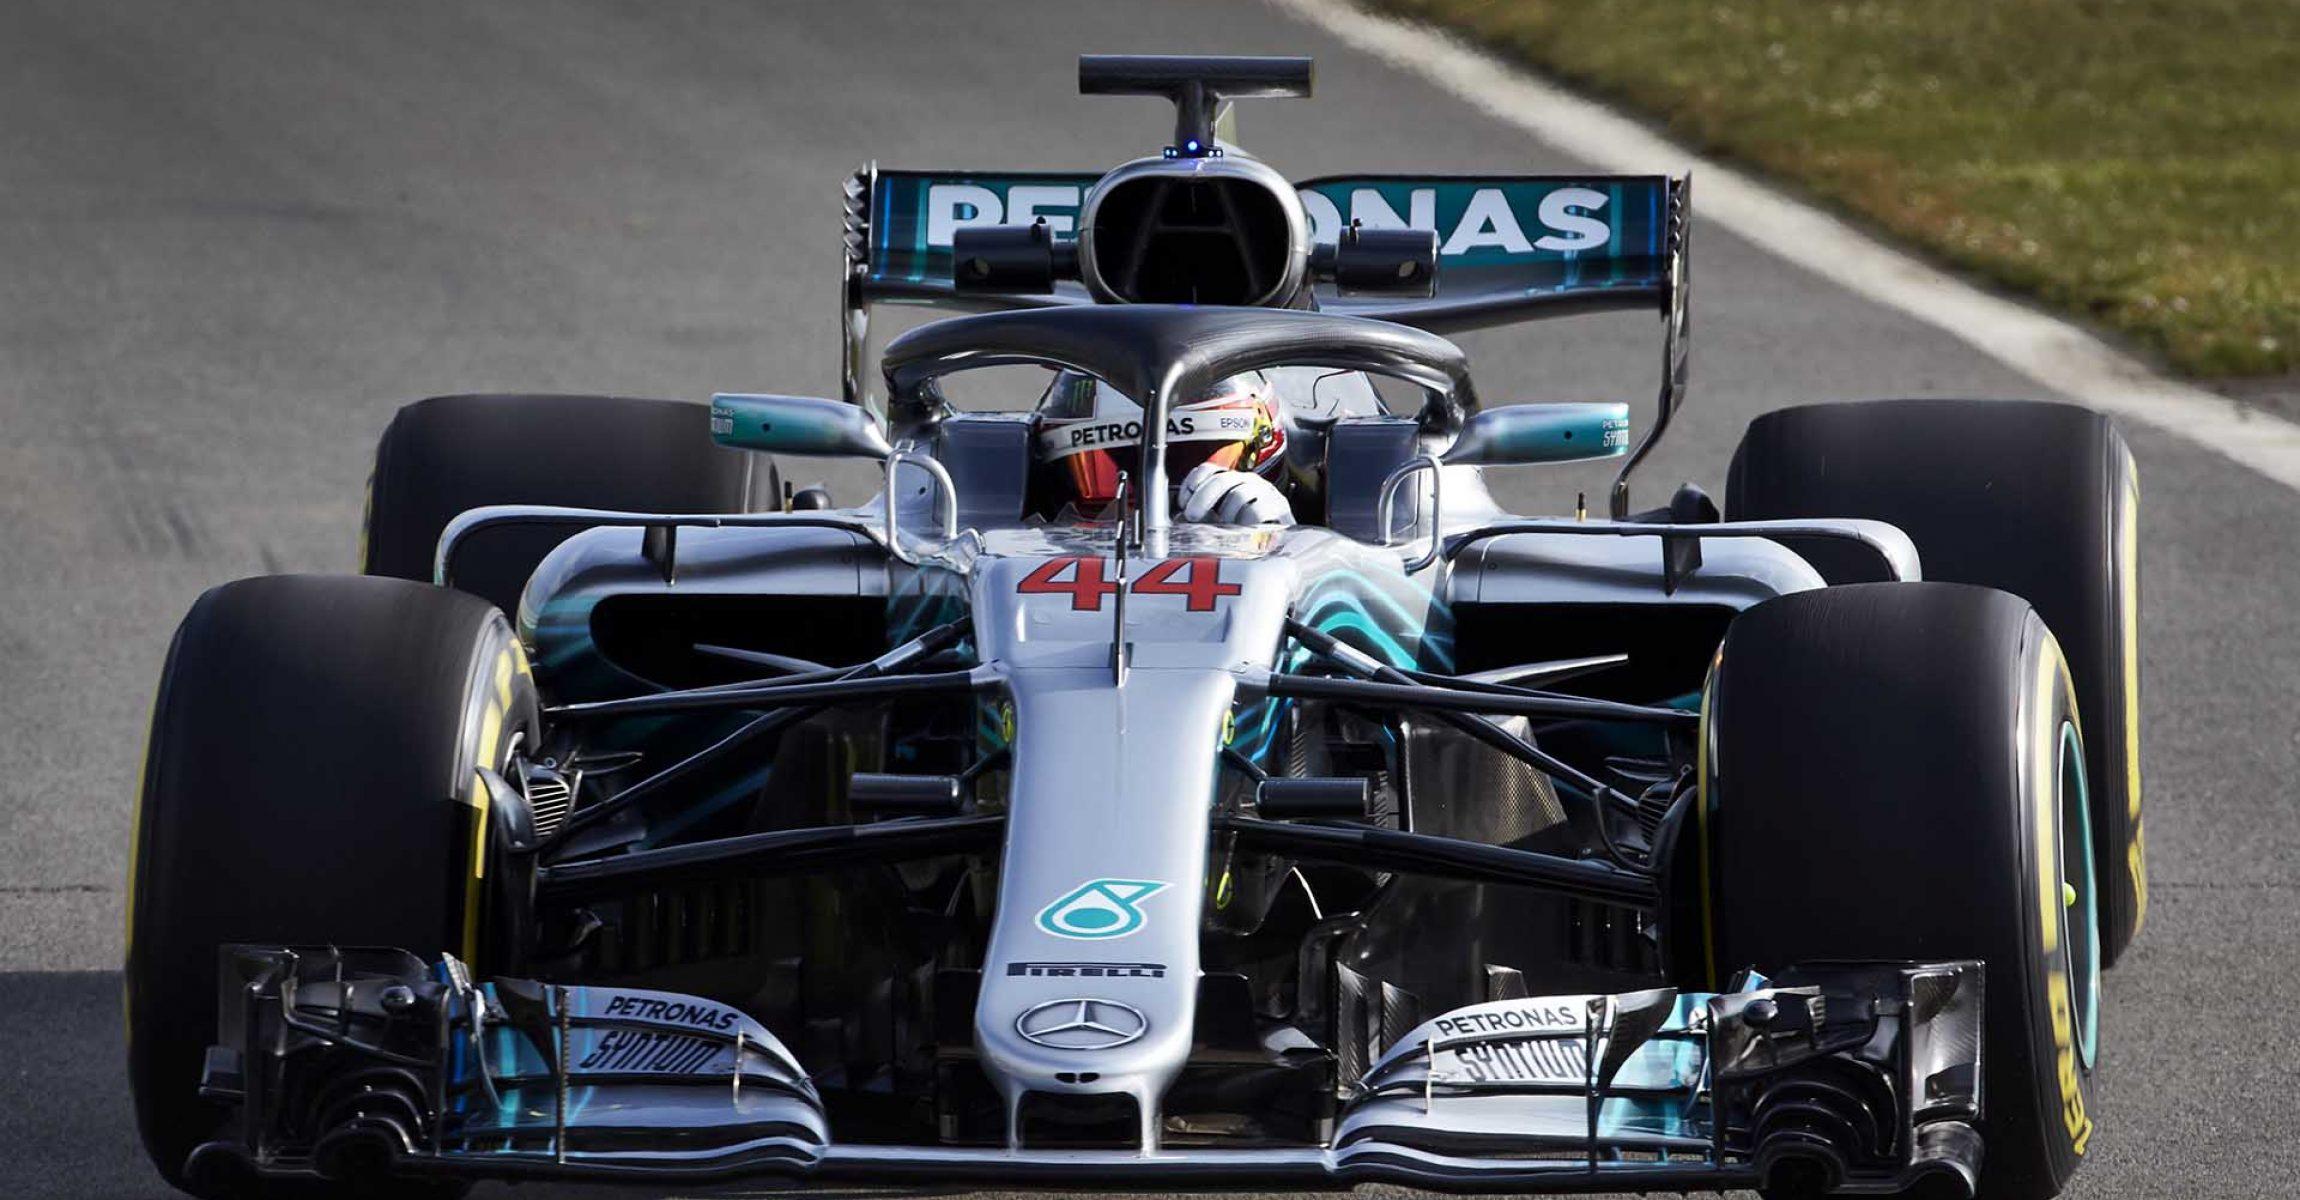 F1 W09 EQ Power+ Launch, Silverstone - Steve Etherington Lewis Hamilton Mercedes